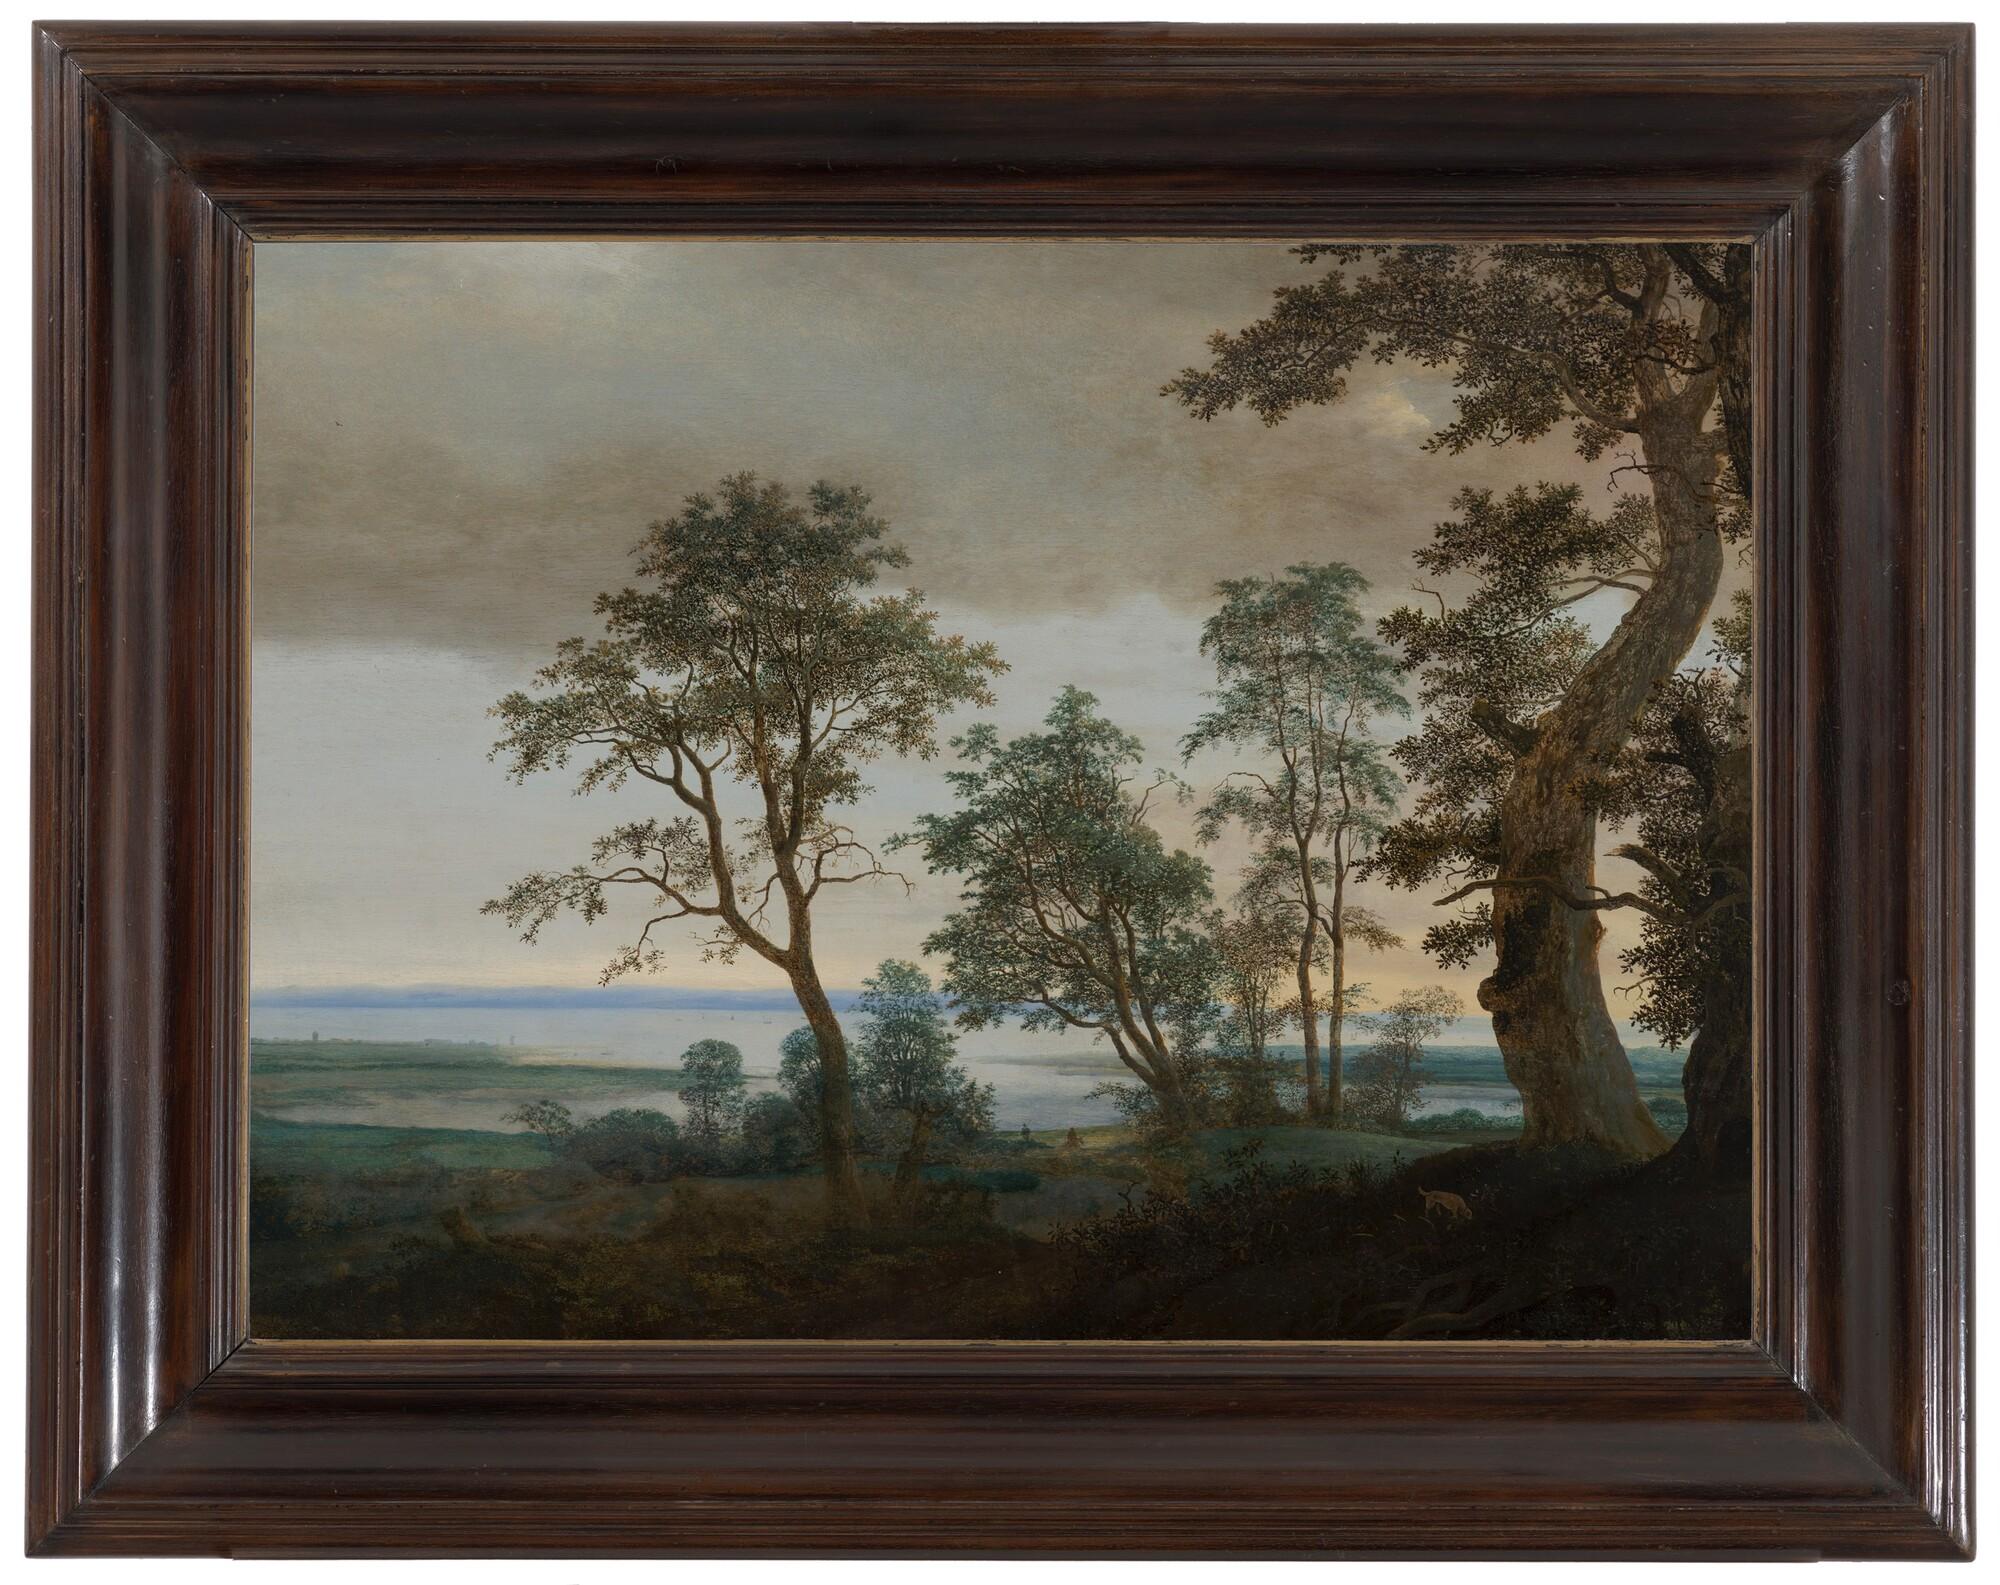 Flusslandschaft mit Bäumen - Cornelis Vroom, um 1638